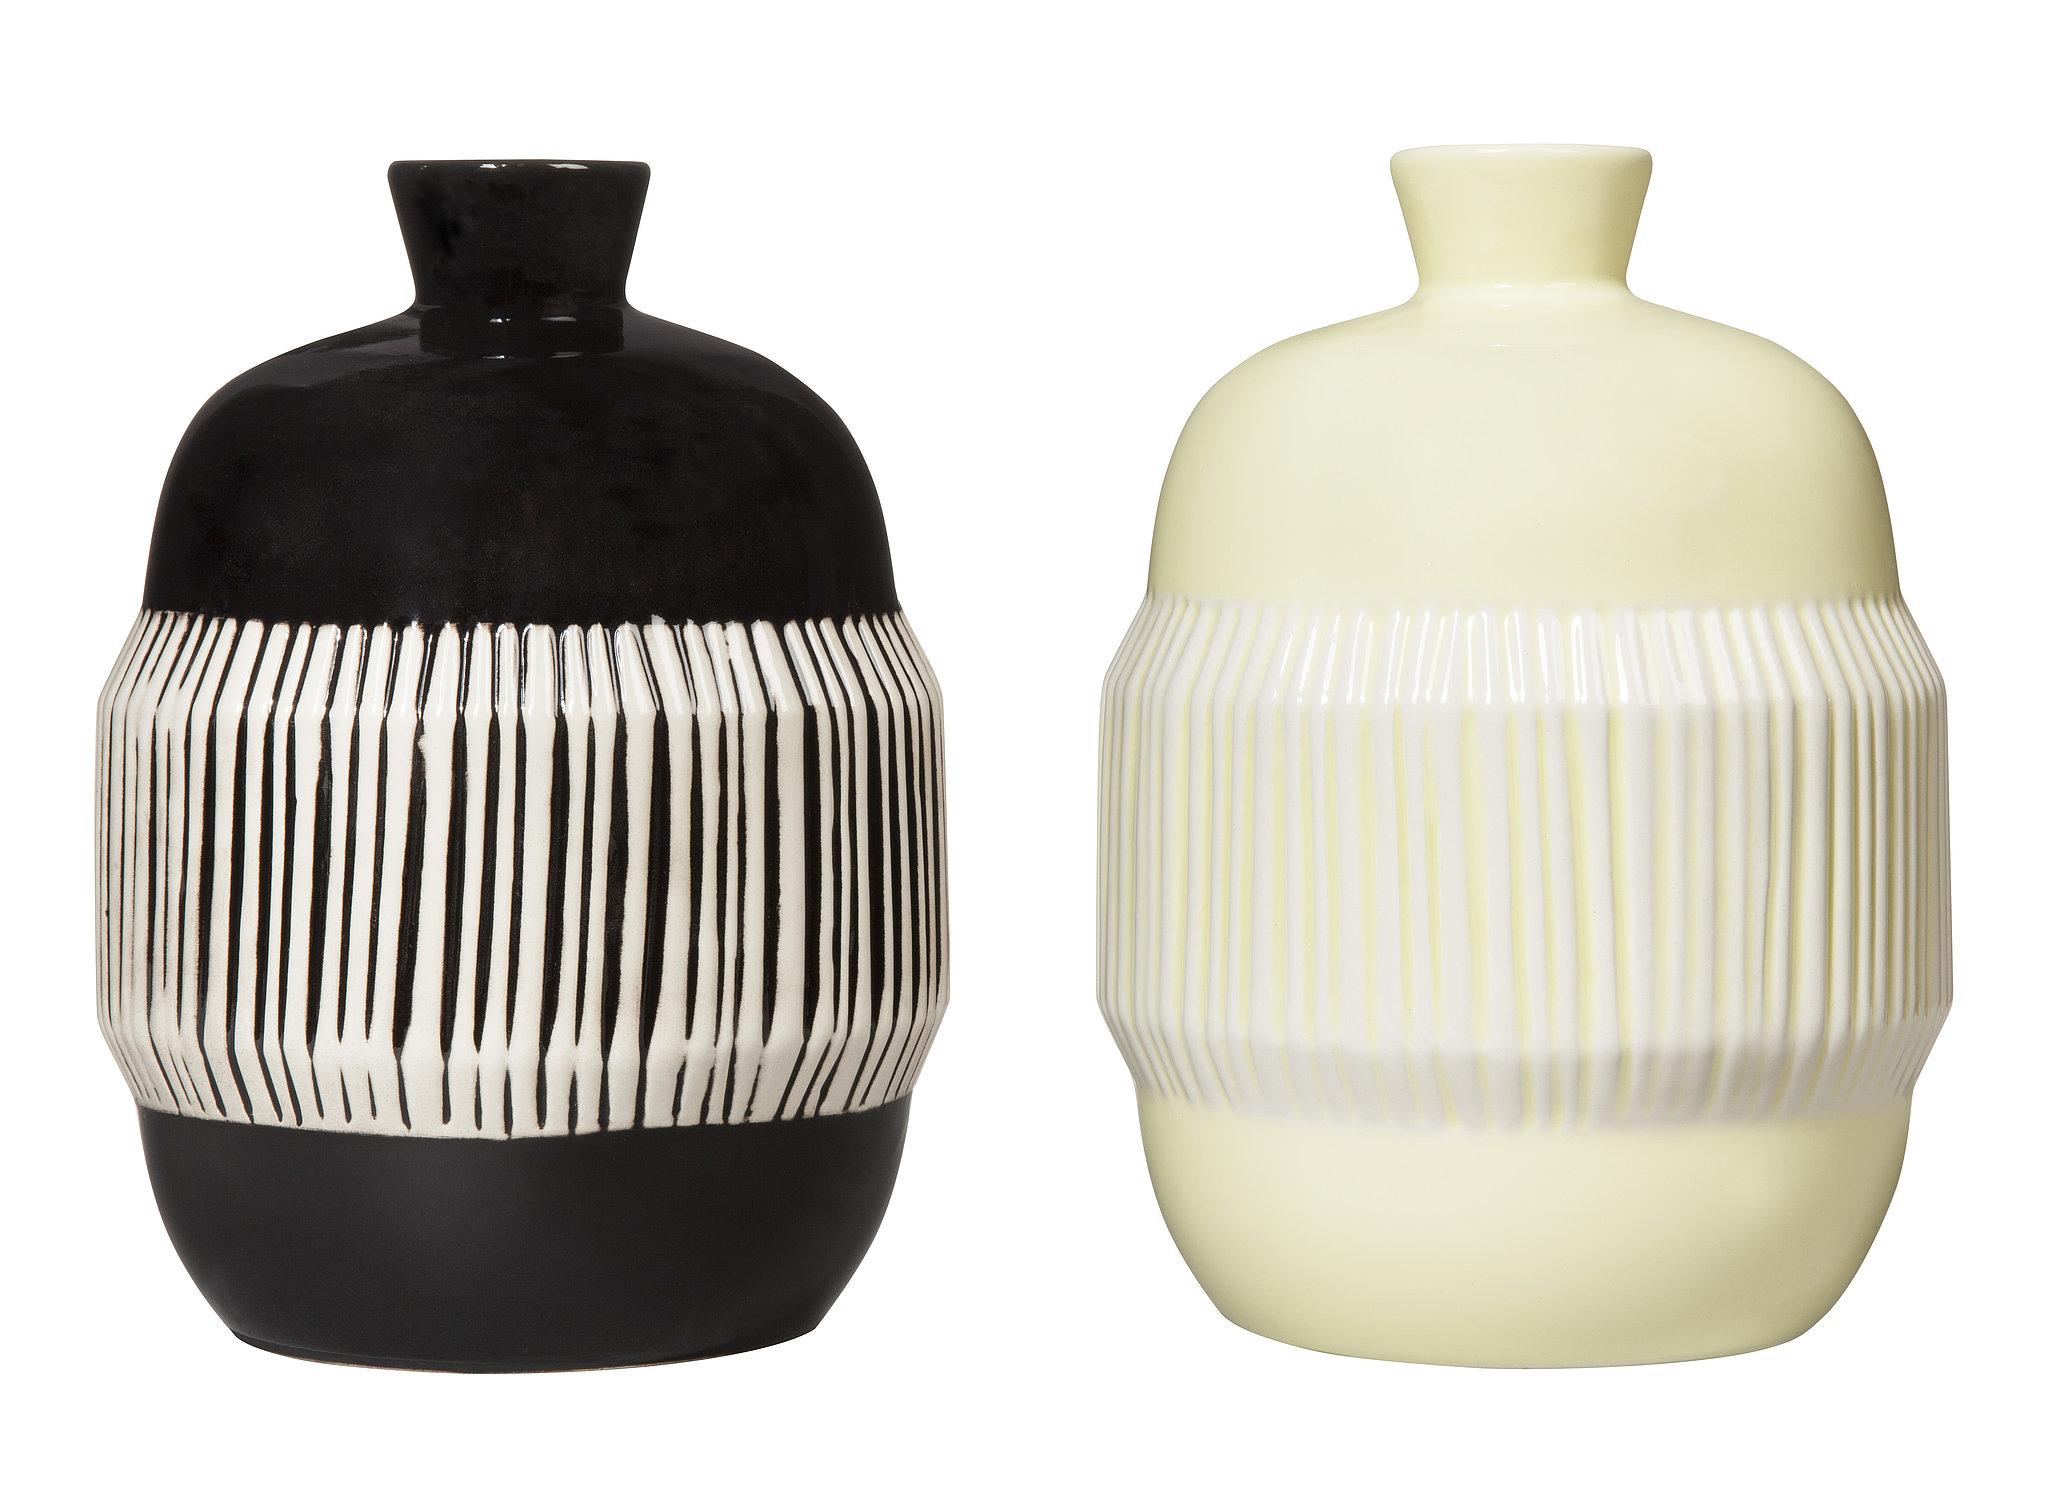 Stoneware Vases ($18 each)